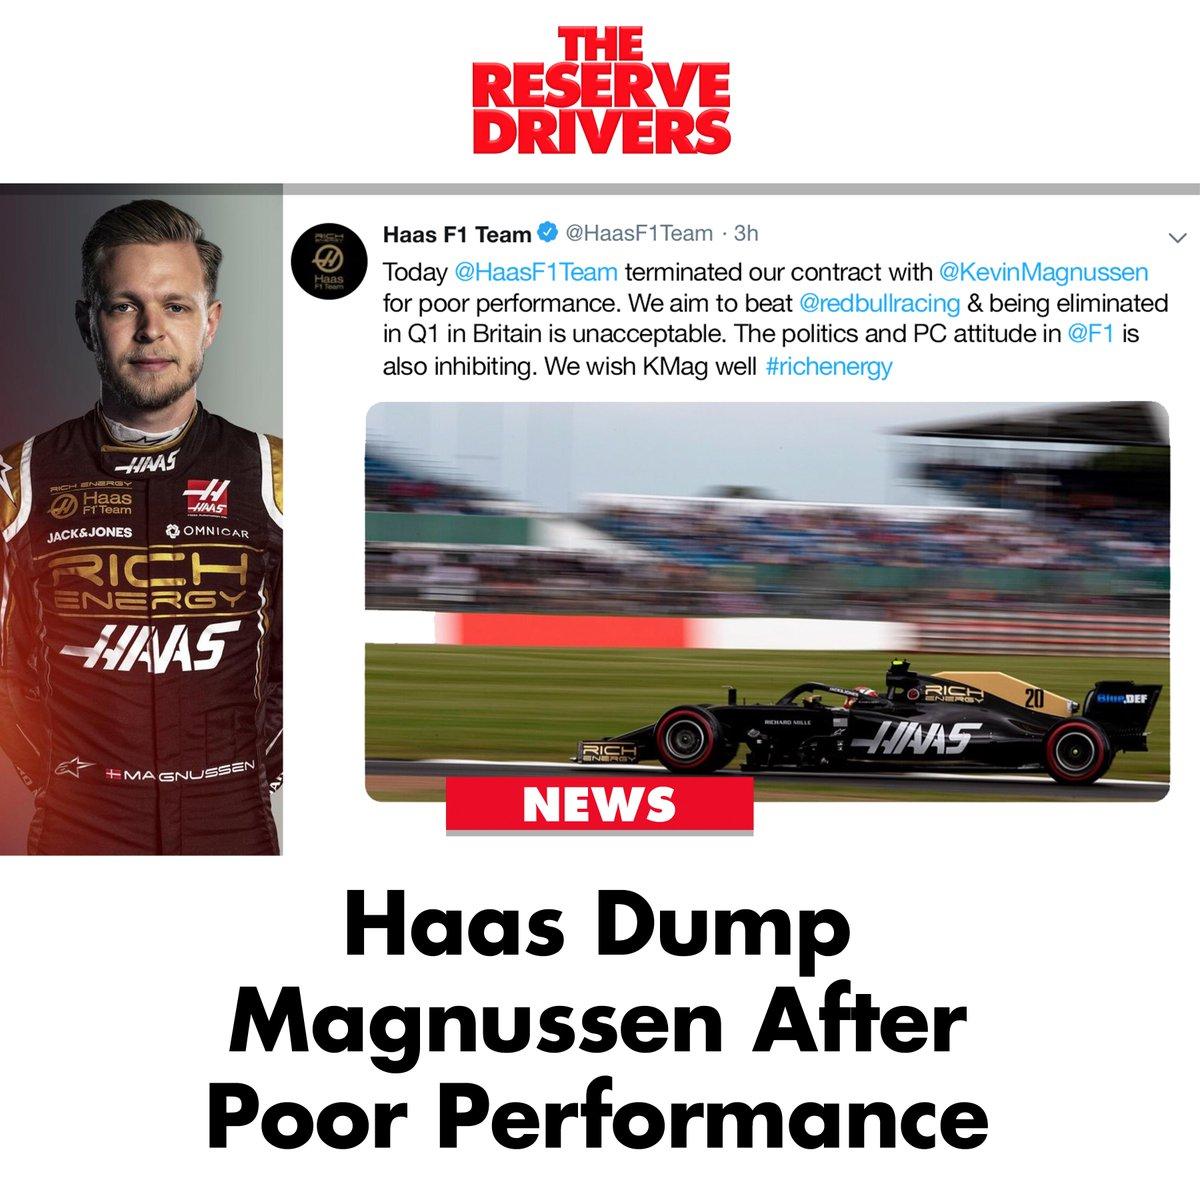 Kevin Magnussen dumped by @HaasF1Team after #Q1!  #BritishGP 🇬🇧 #F1 #BritishGP2019 #F1Qualifying